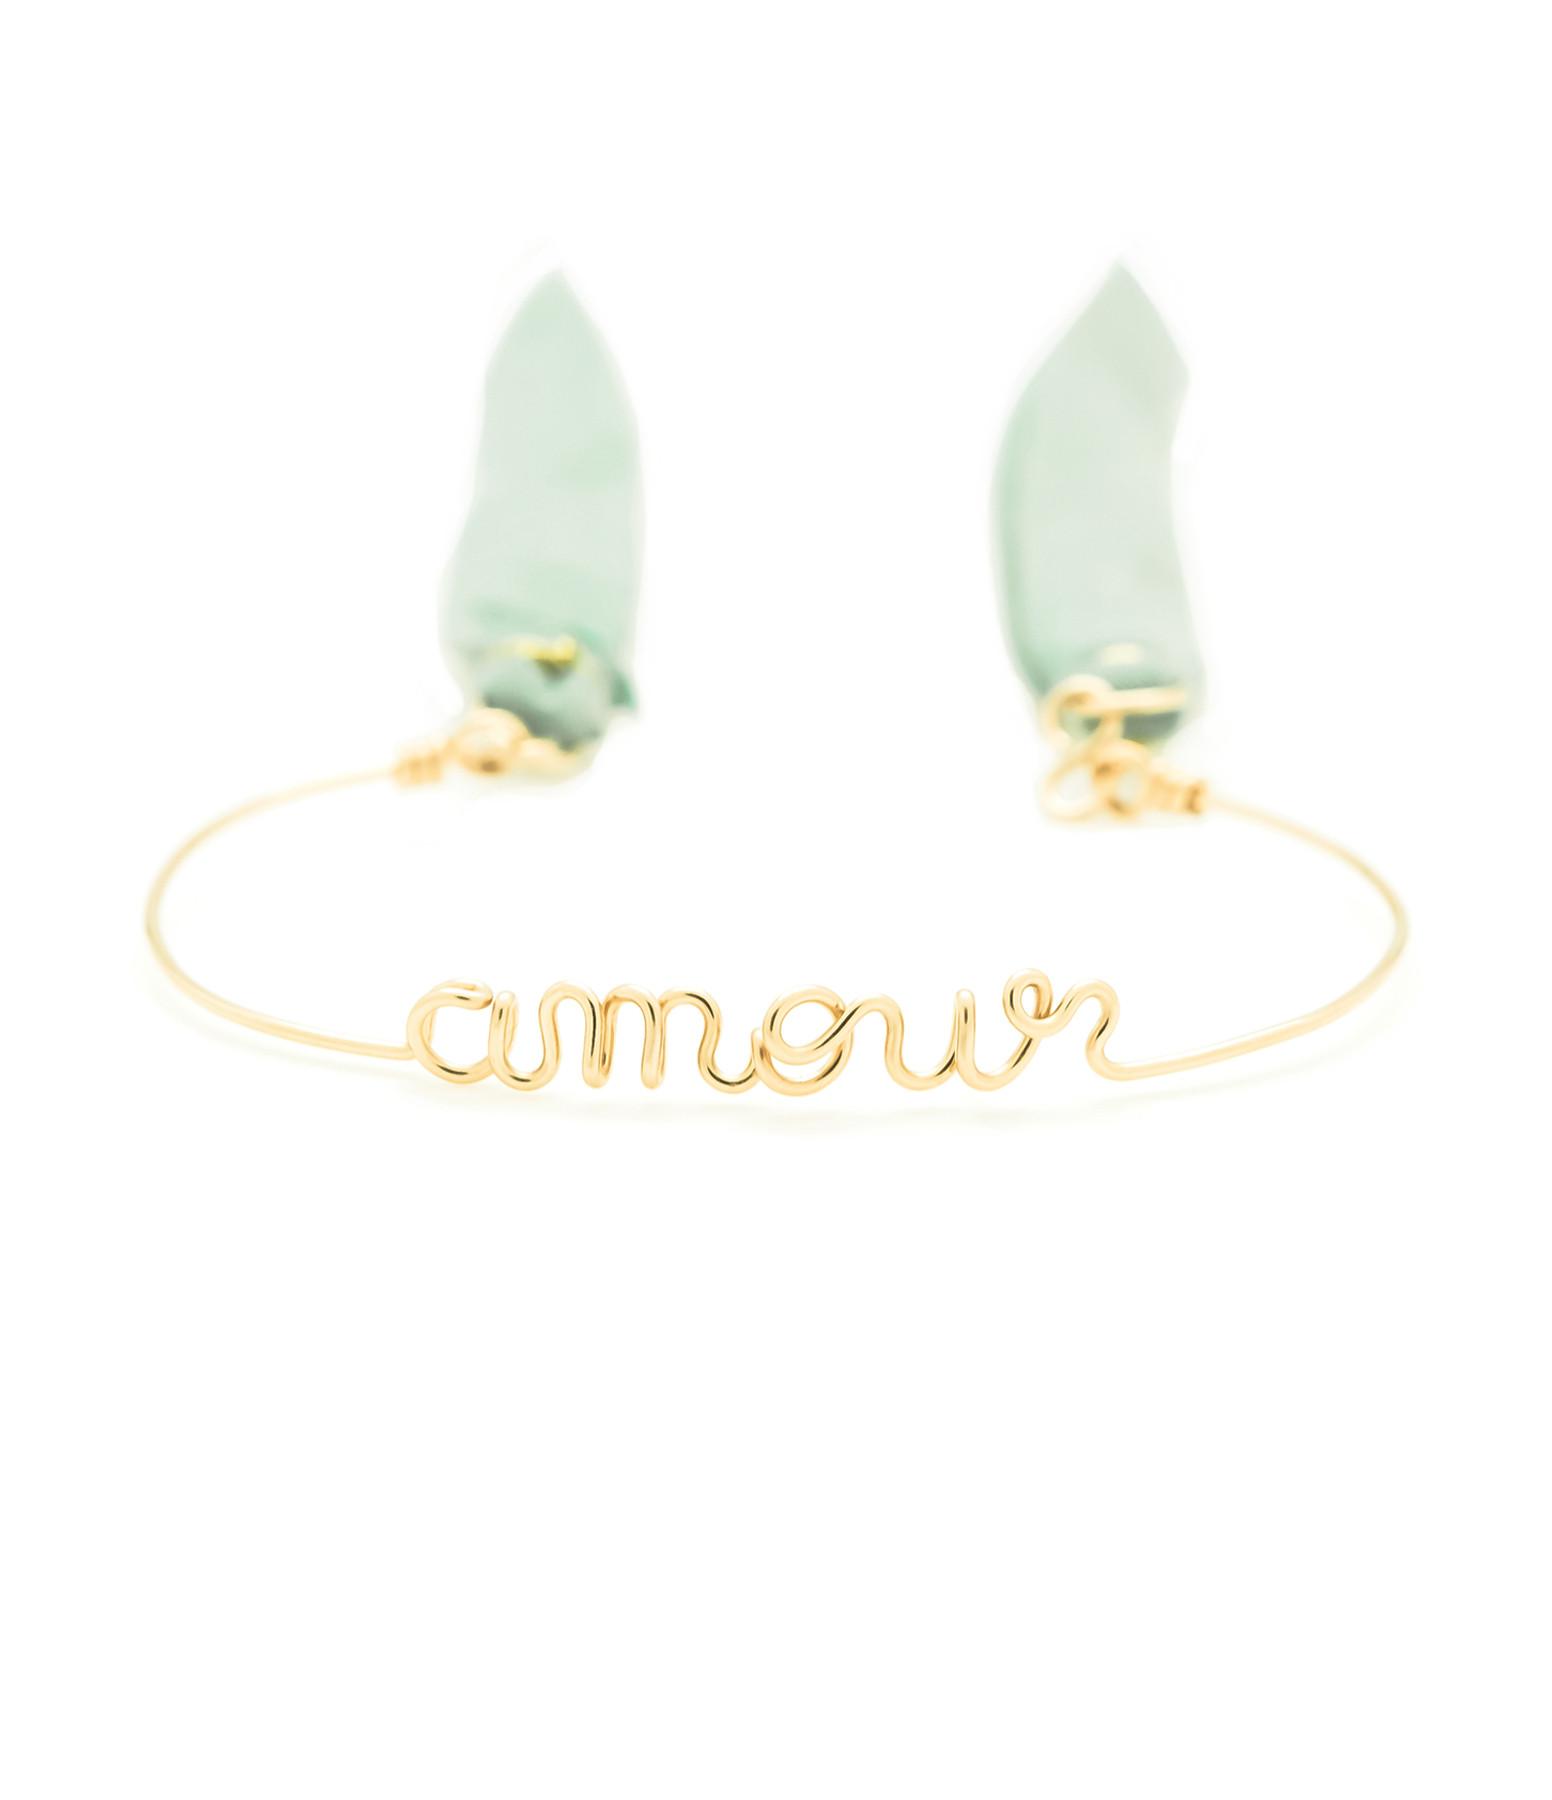 ATELIER PAULIN - Bracelet Fil Amour Liens Vert Noir Gold Filled 14K